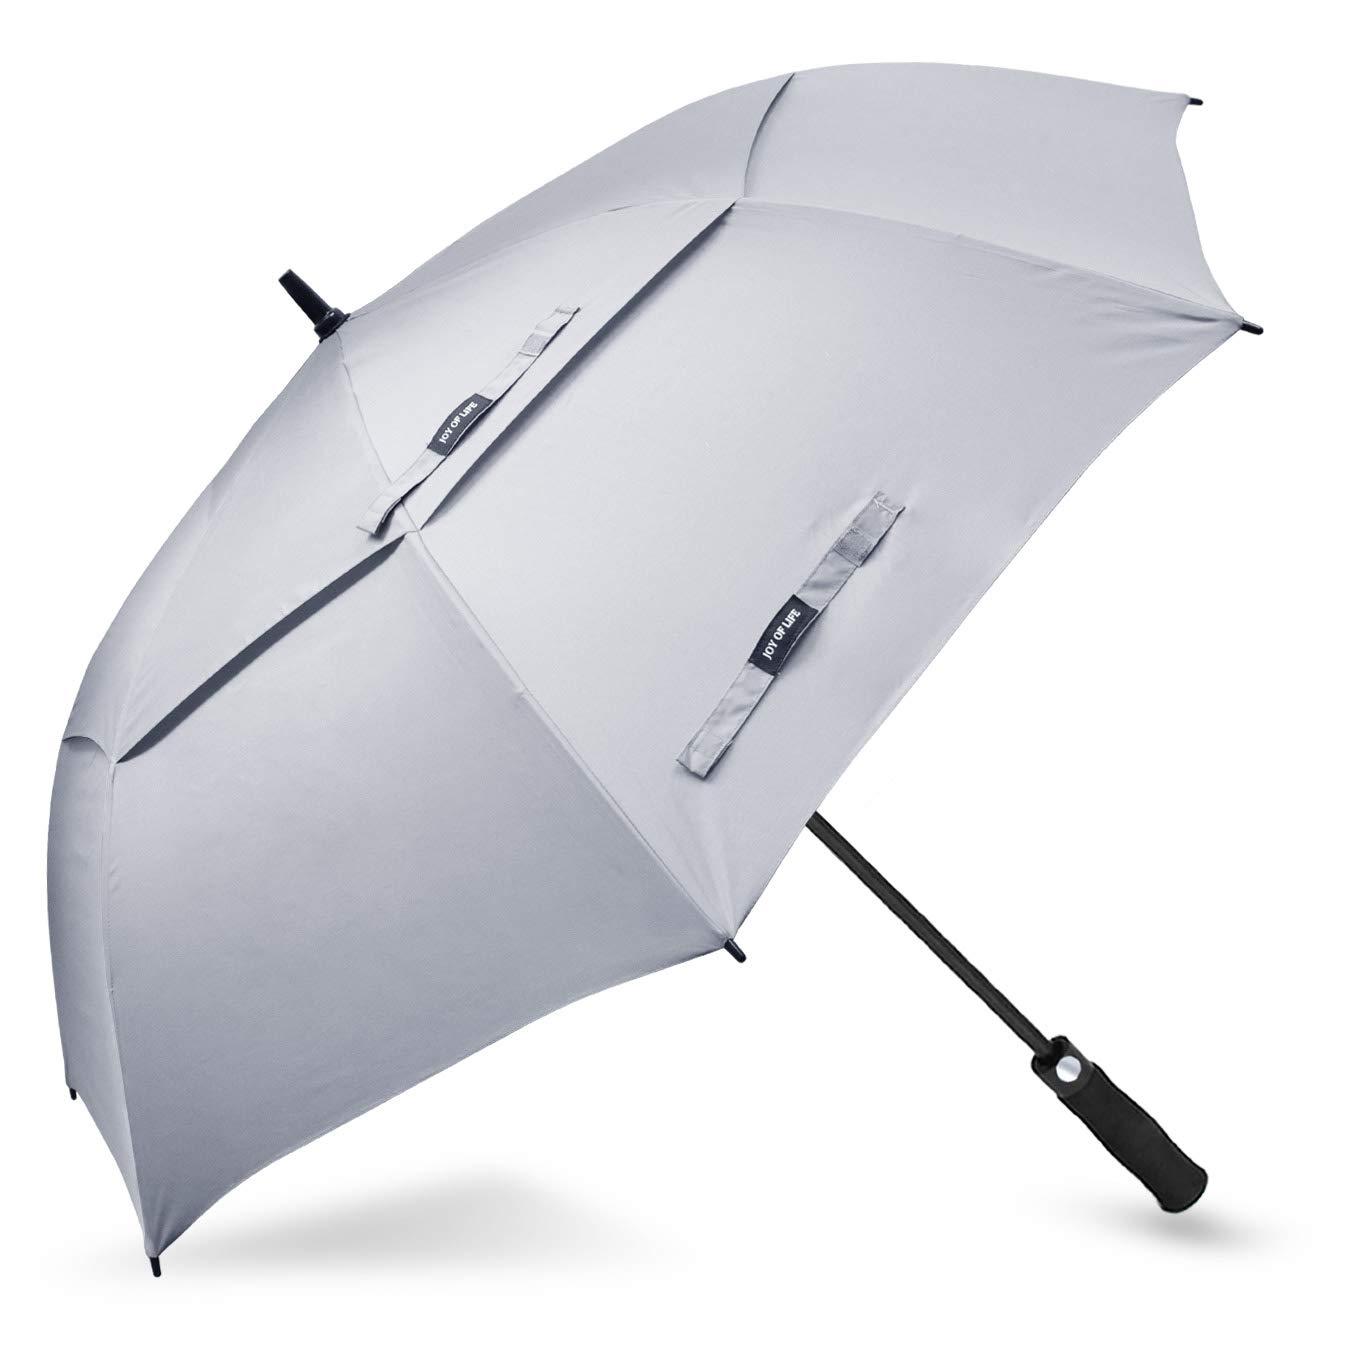 ZOMAKE Golf Umbrella Windproof Large 68 inch Double Canopy Automatic Open Umbrella for Men - Vented Sun Umbrella - Stick Umbrellas